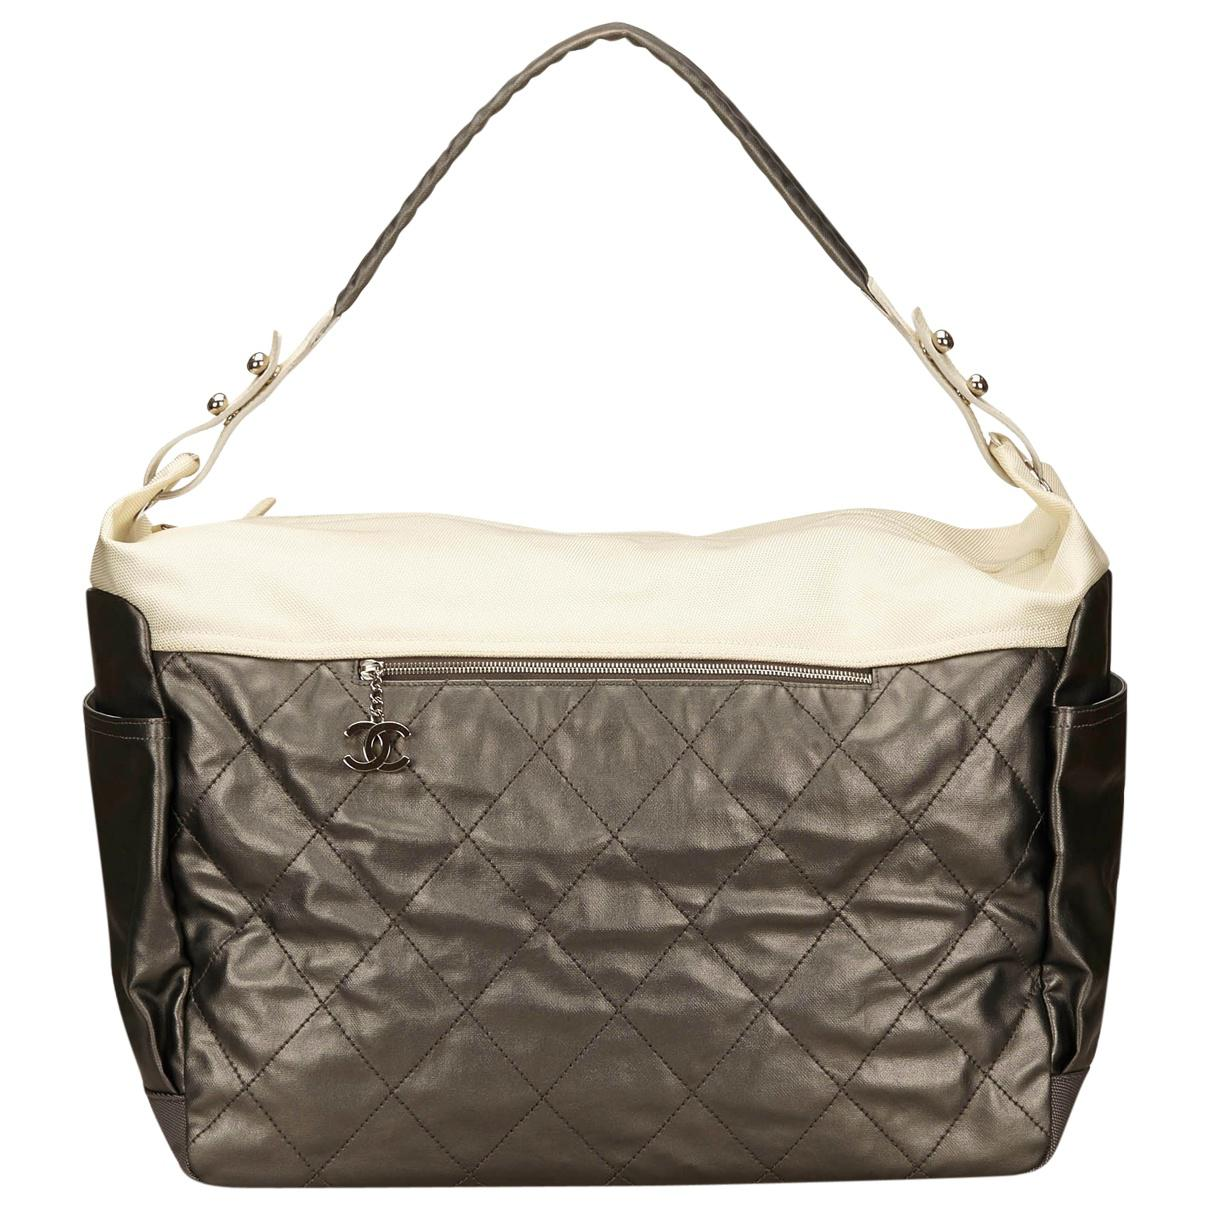 Chanel Pre-owned - Cloth mini bag itXMTe